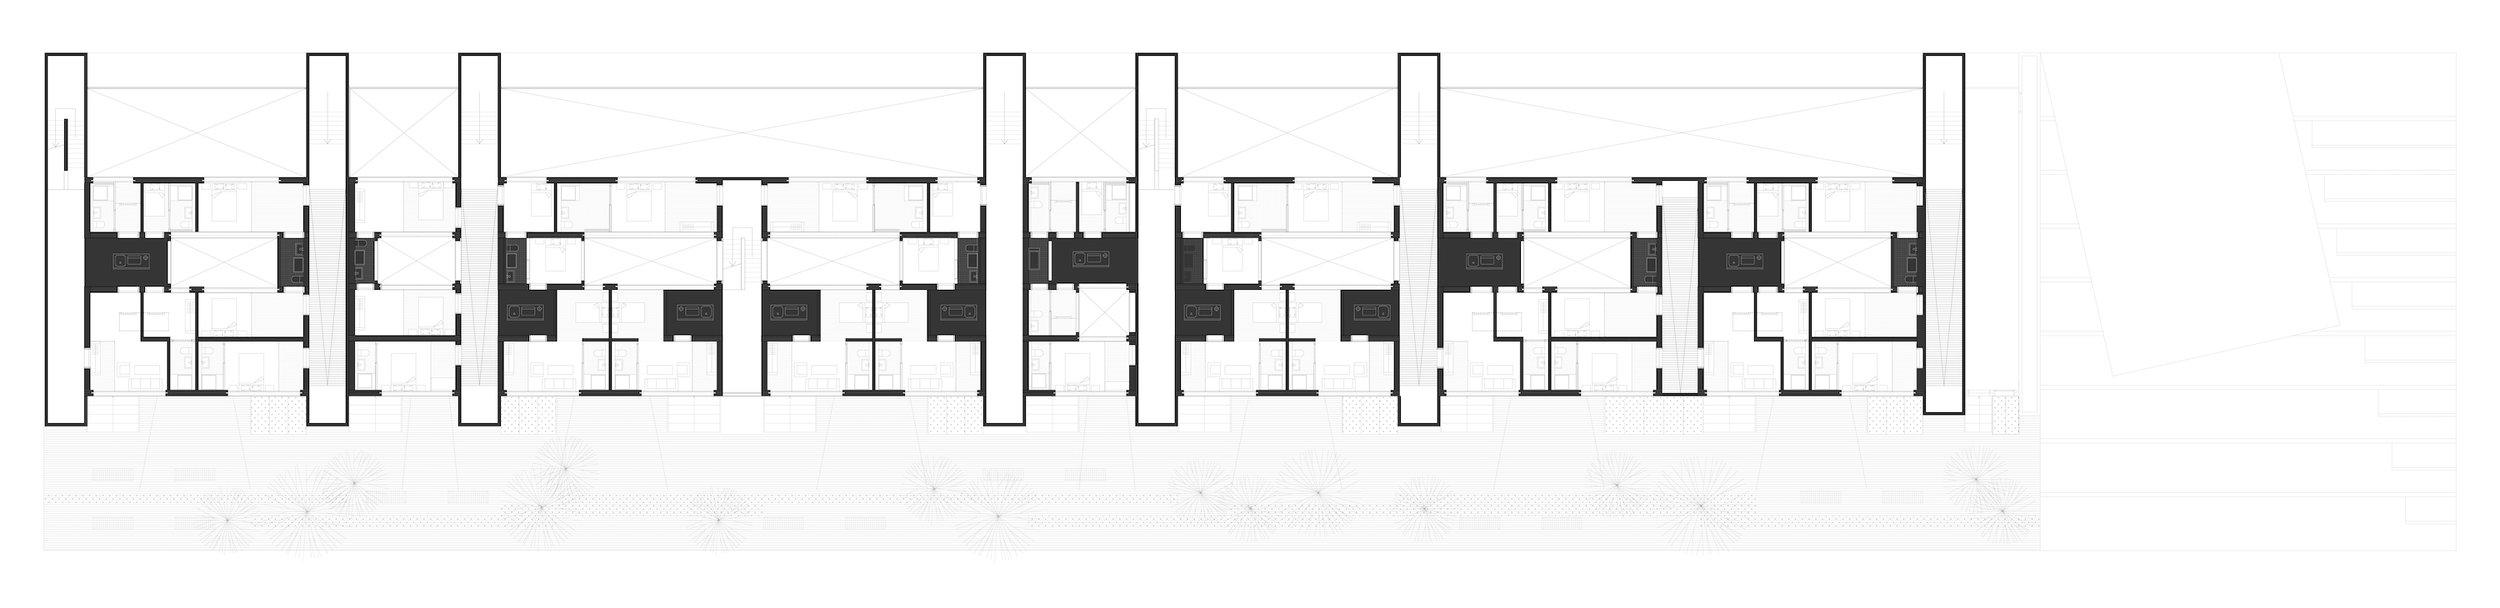 180419W13_Plan_Cluster2 [Converted]-01.jpg